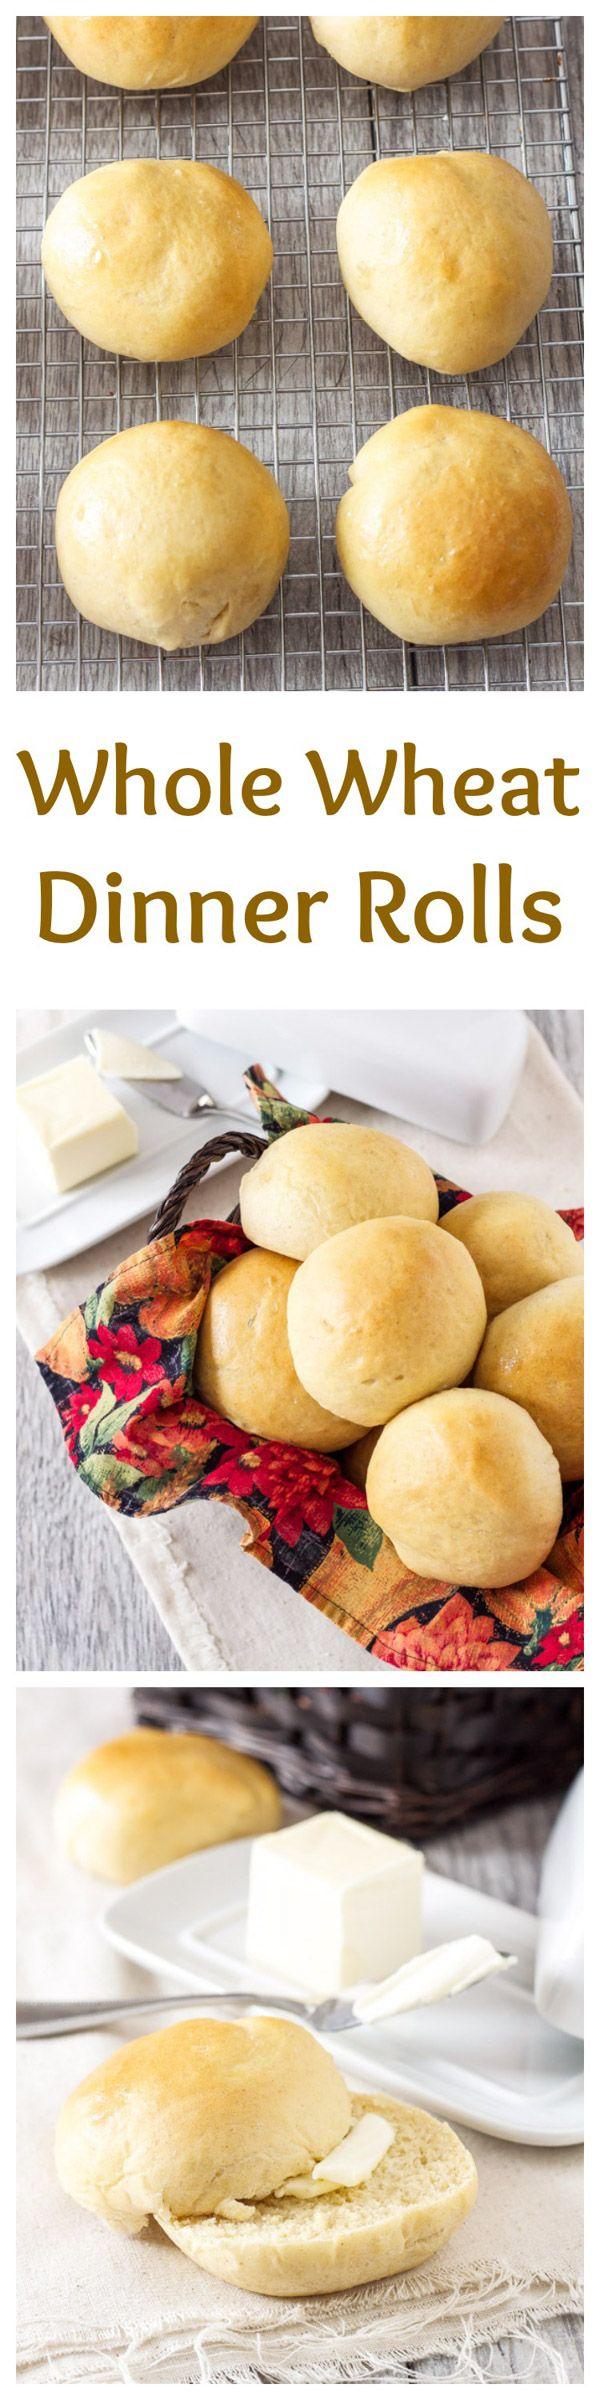 Whole Wheat Dinner Rolls | Recipe Runner | My family's recipe for soft ...